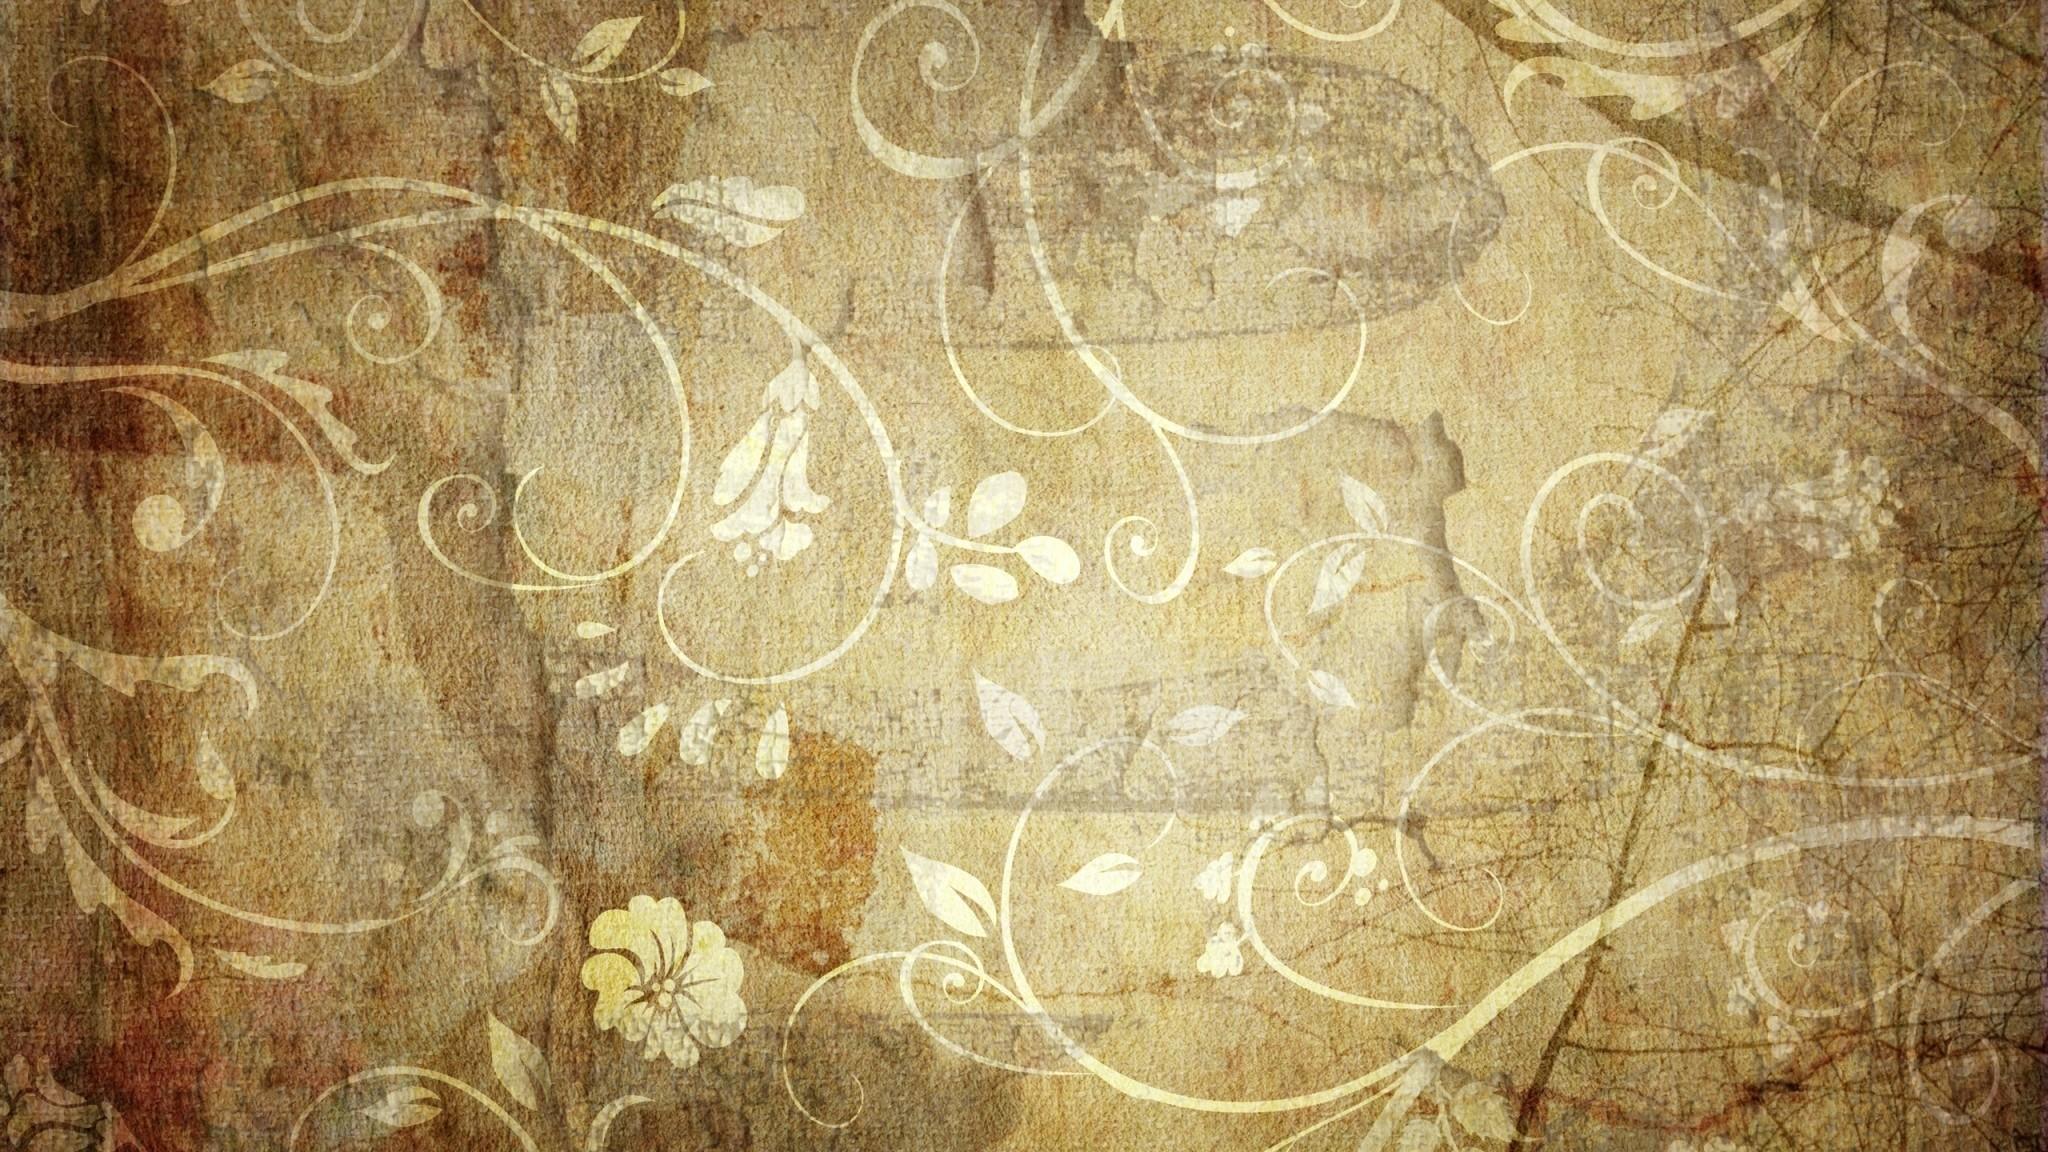 Patterns Paper Background Texture Desktop Wallpapers - Background Texture Images Hd - HD Wallpaper